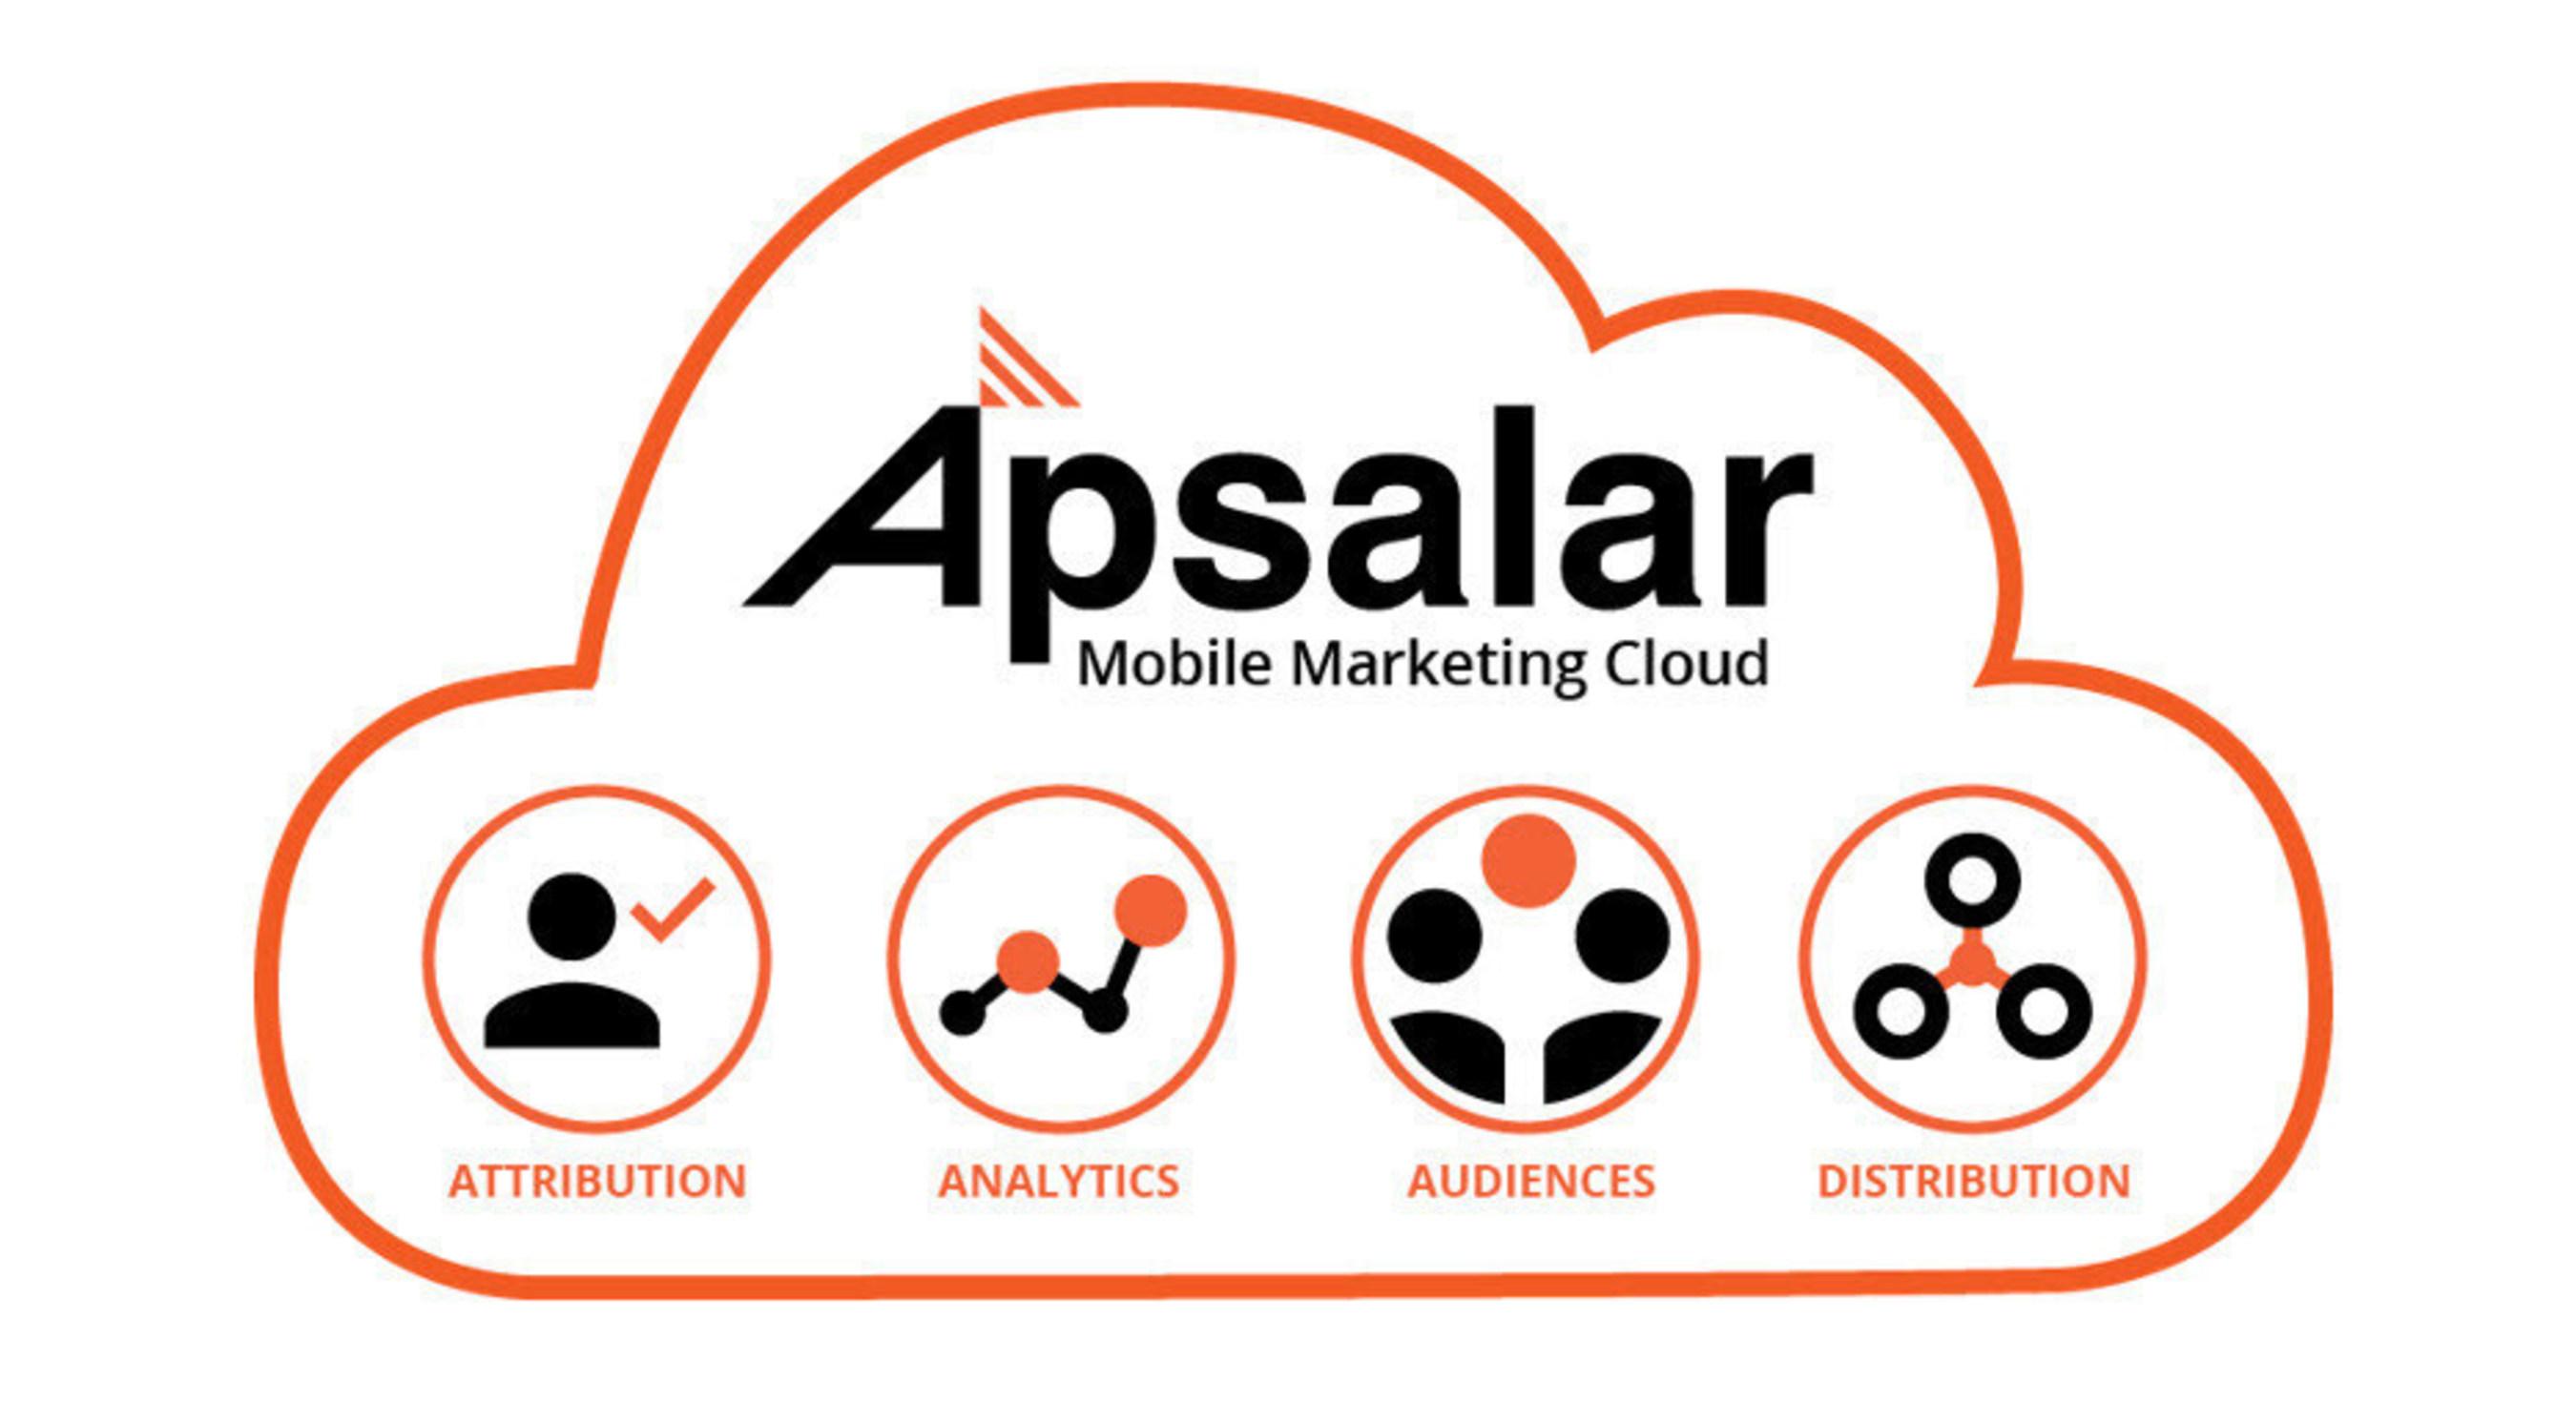 Apsalar Mobile Marketing Cloud Logo